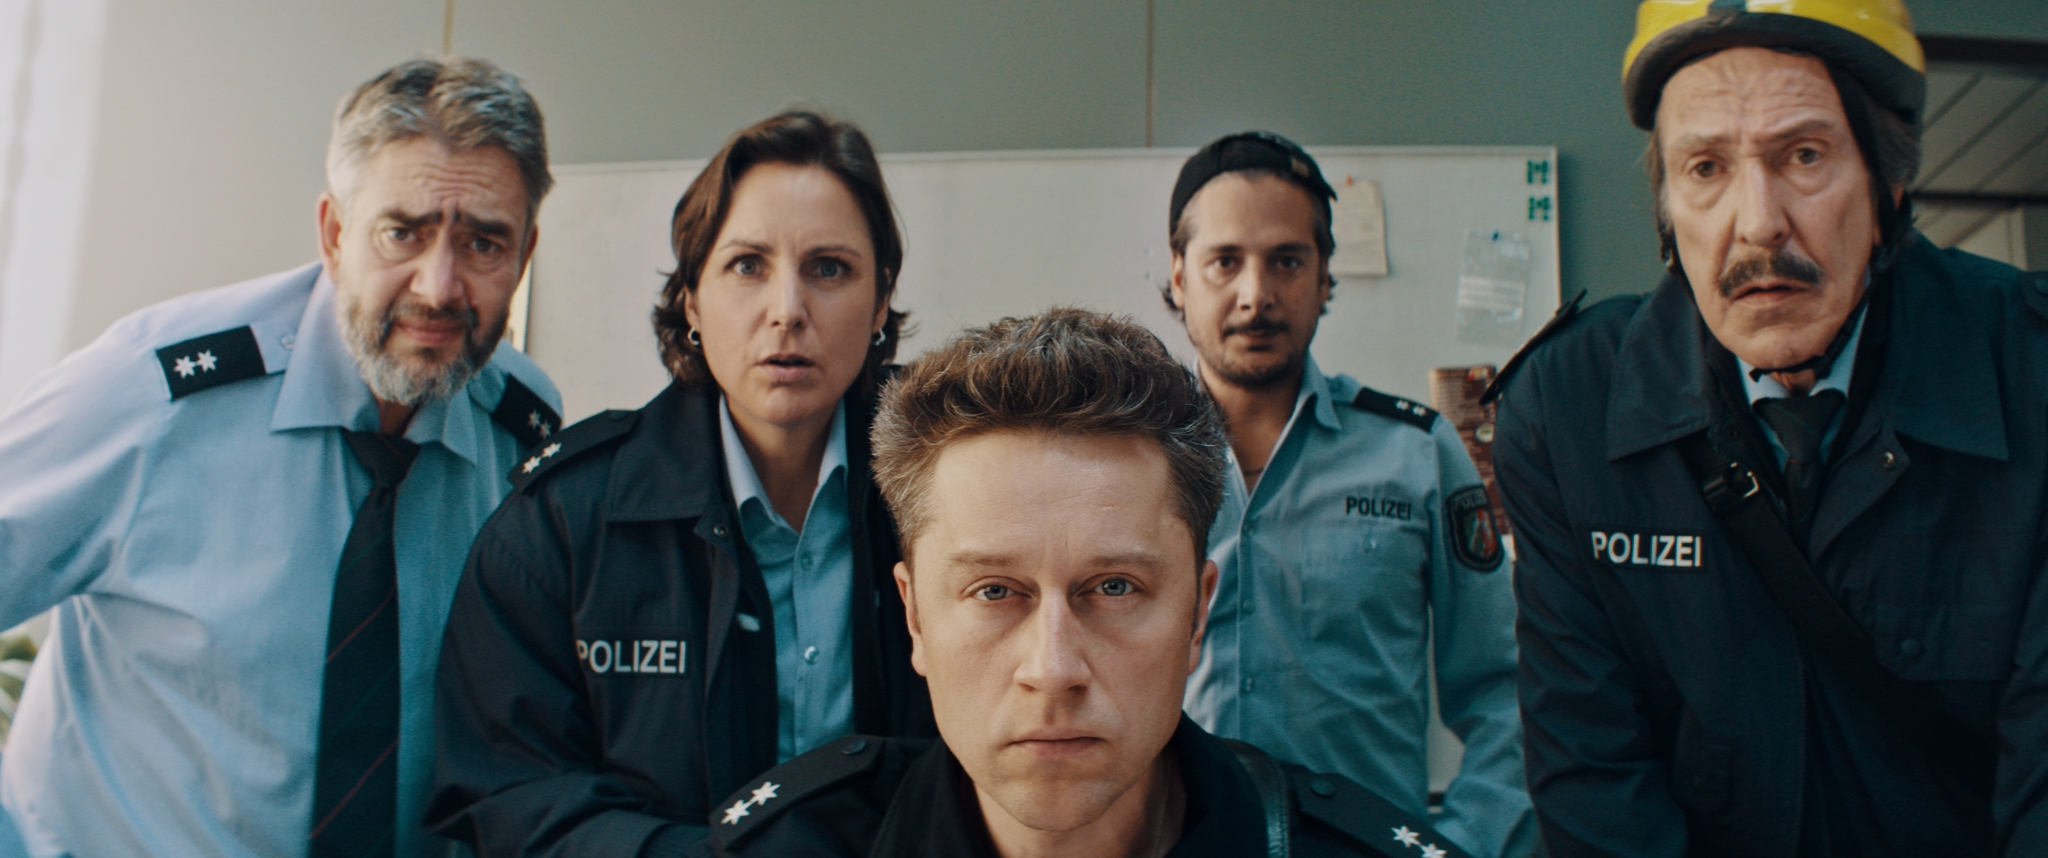 Neu im Kino: Faking Bullshit